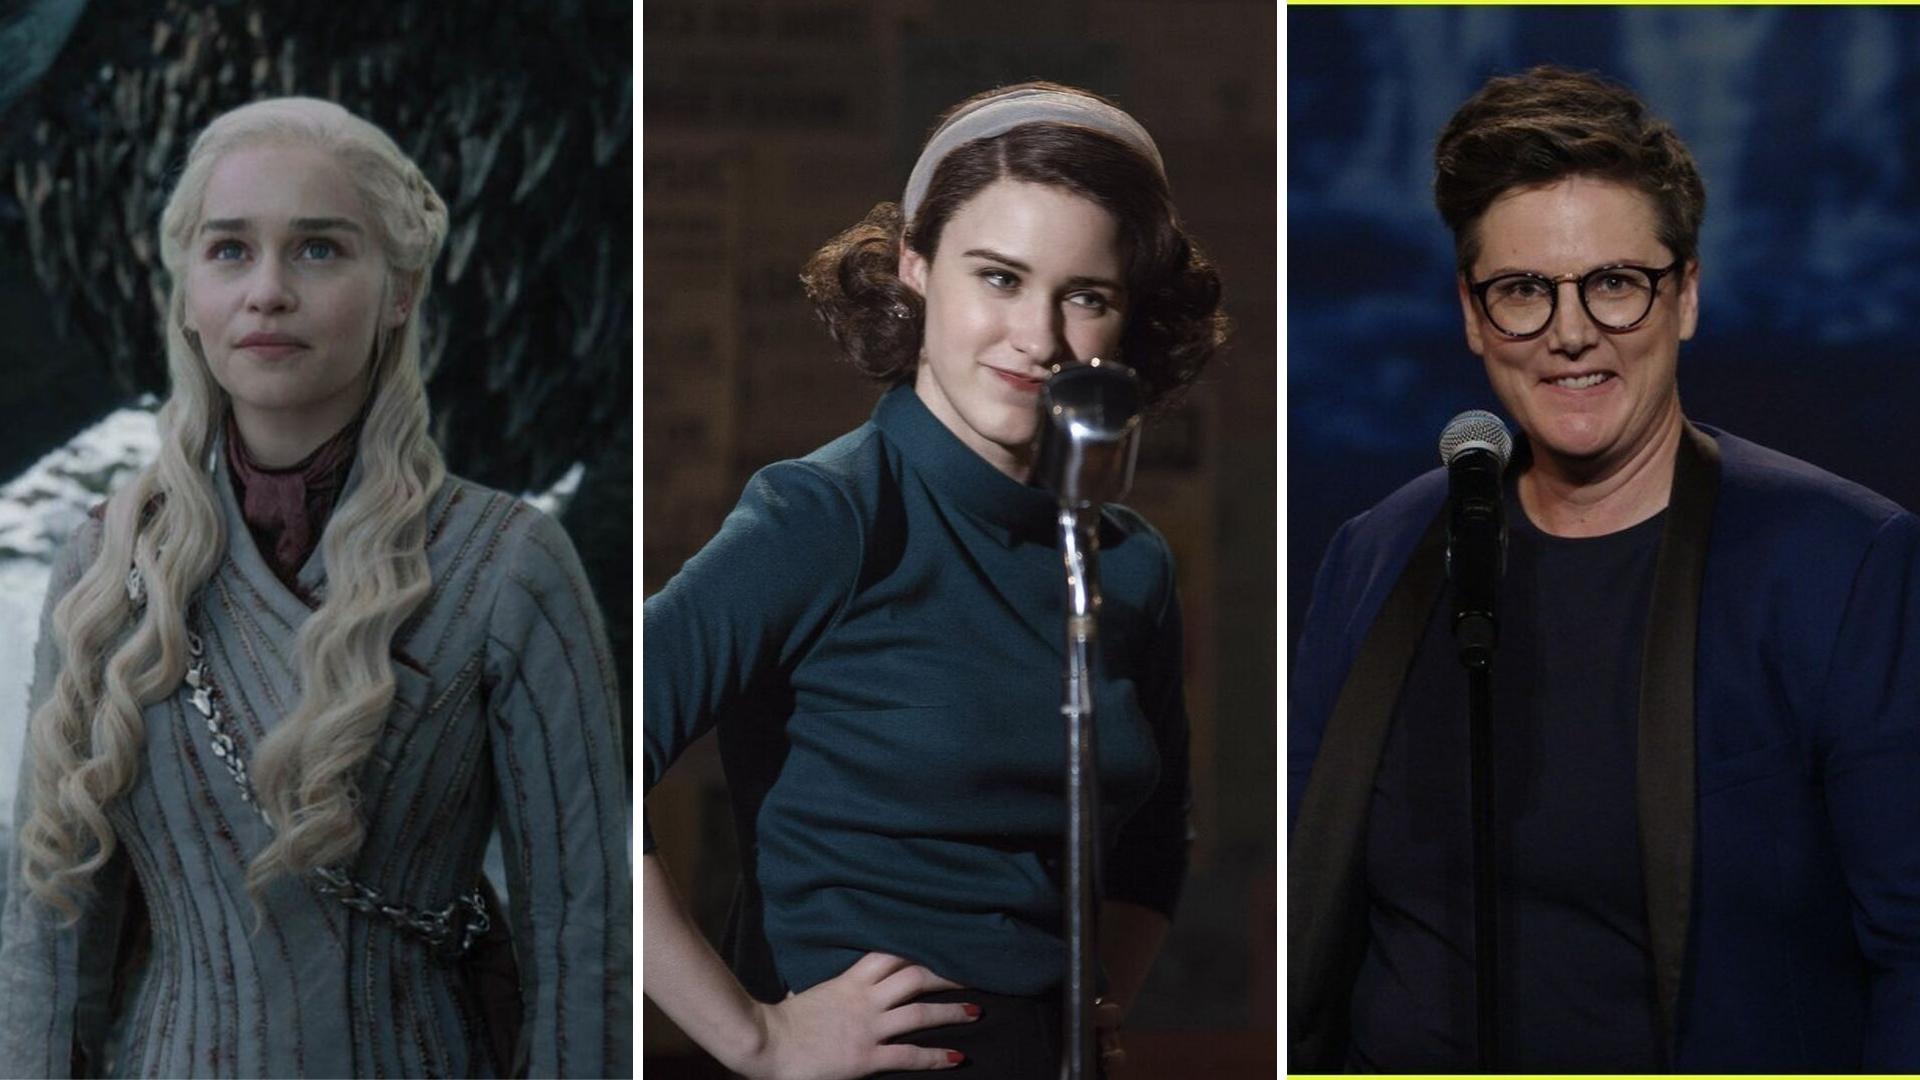 'GoT,' 'Mrs Maisel,' 'Nanette' Win Big at Creative Arts Emmys